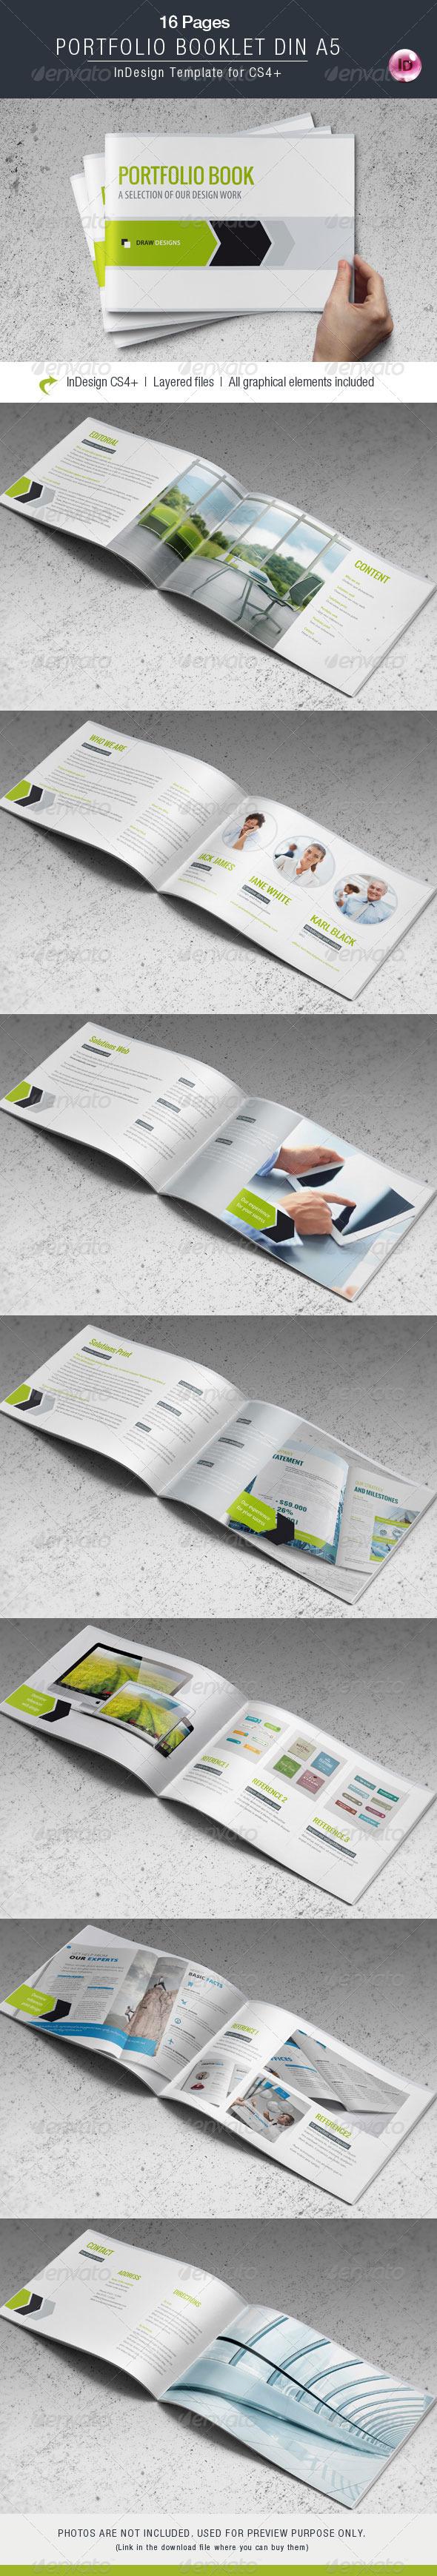 GraphicRiver Portfolio Booklet DIN A5 7789271